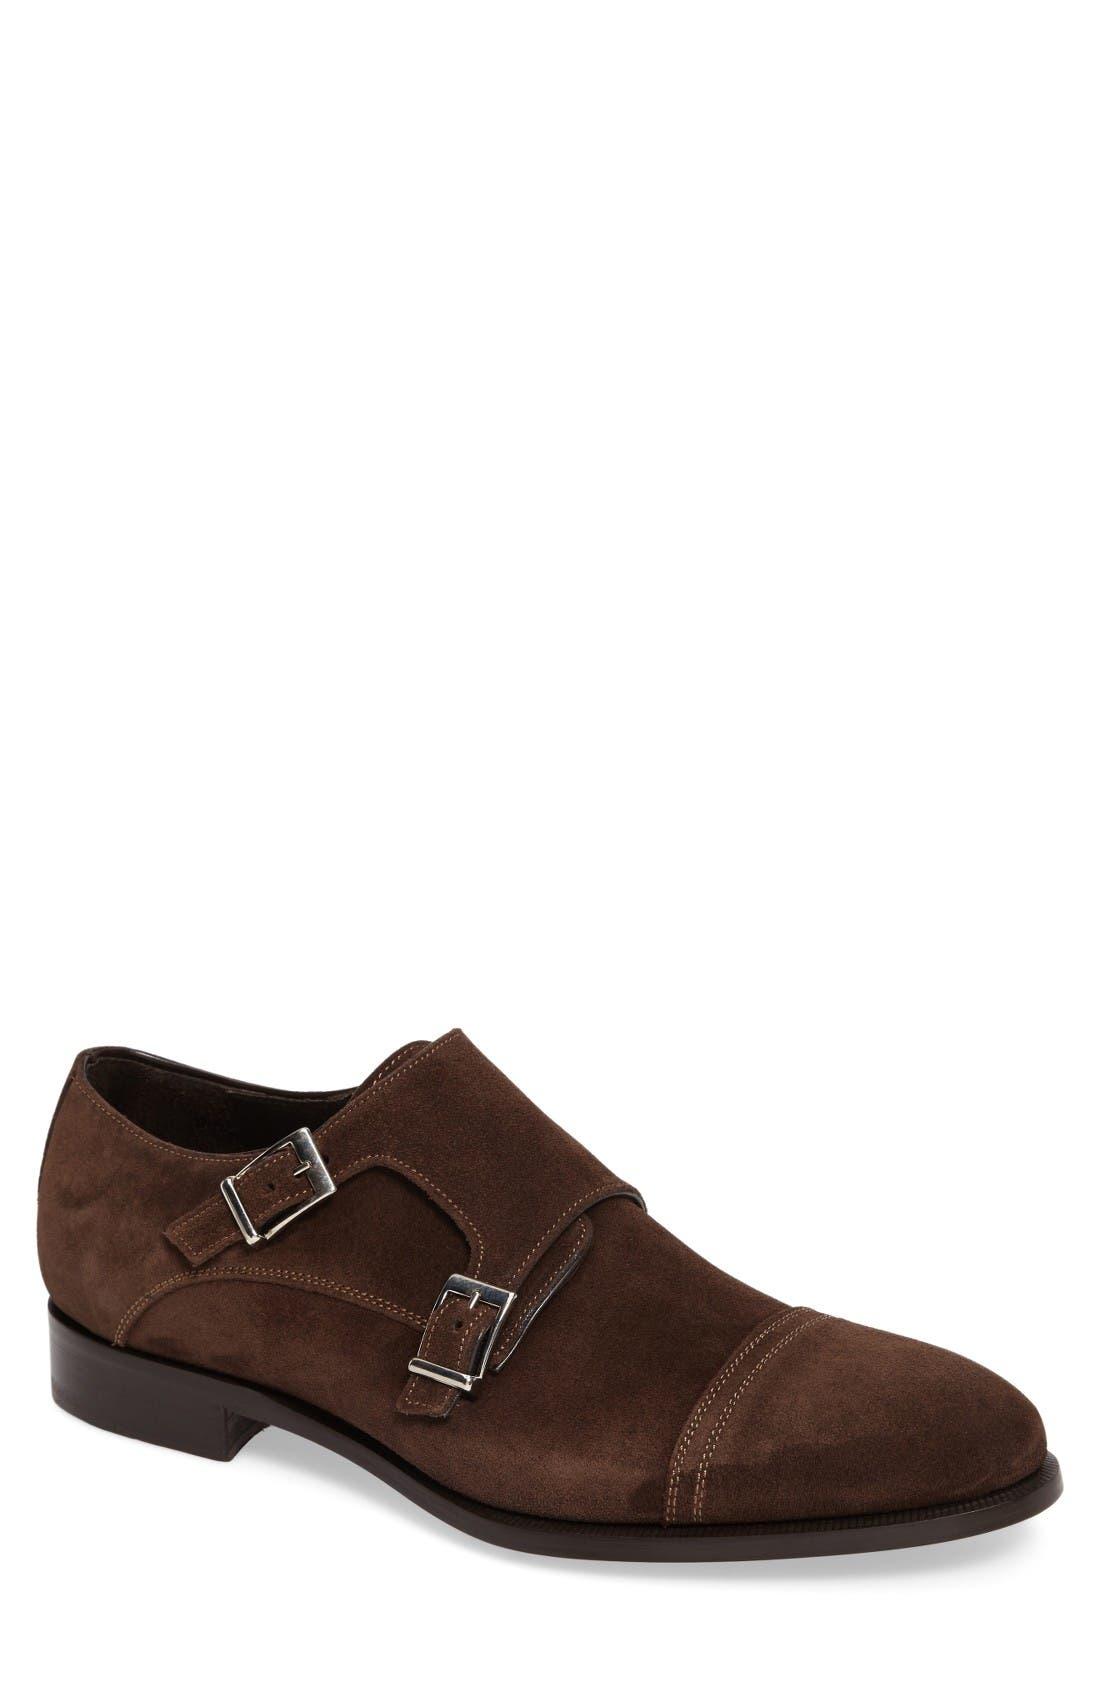 Main Image - Crosby Square Conley Double Monk Strap Shoe (Men)